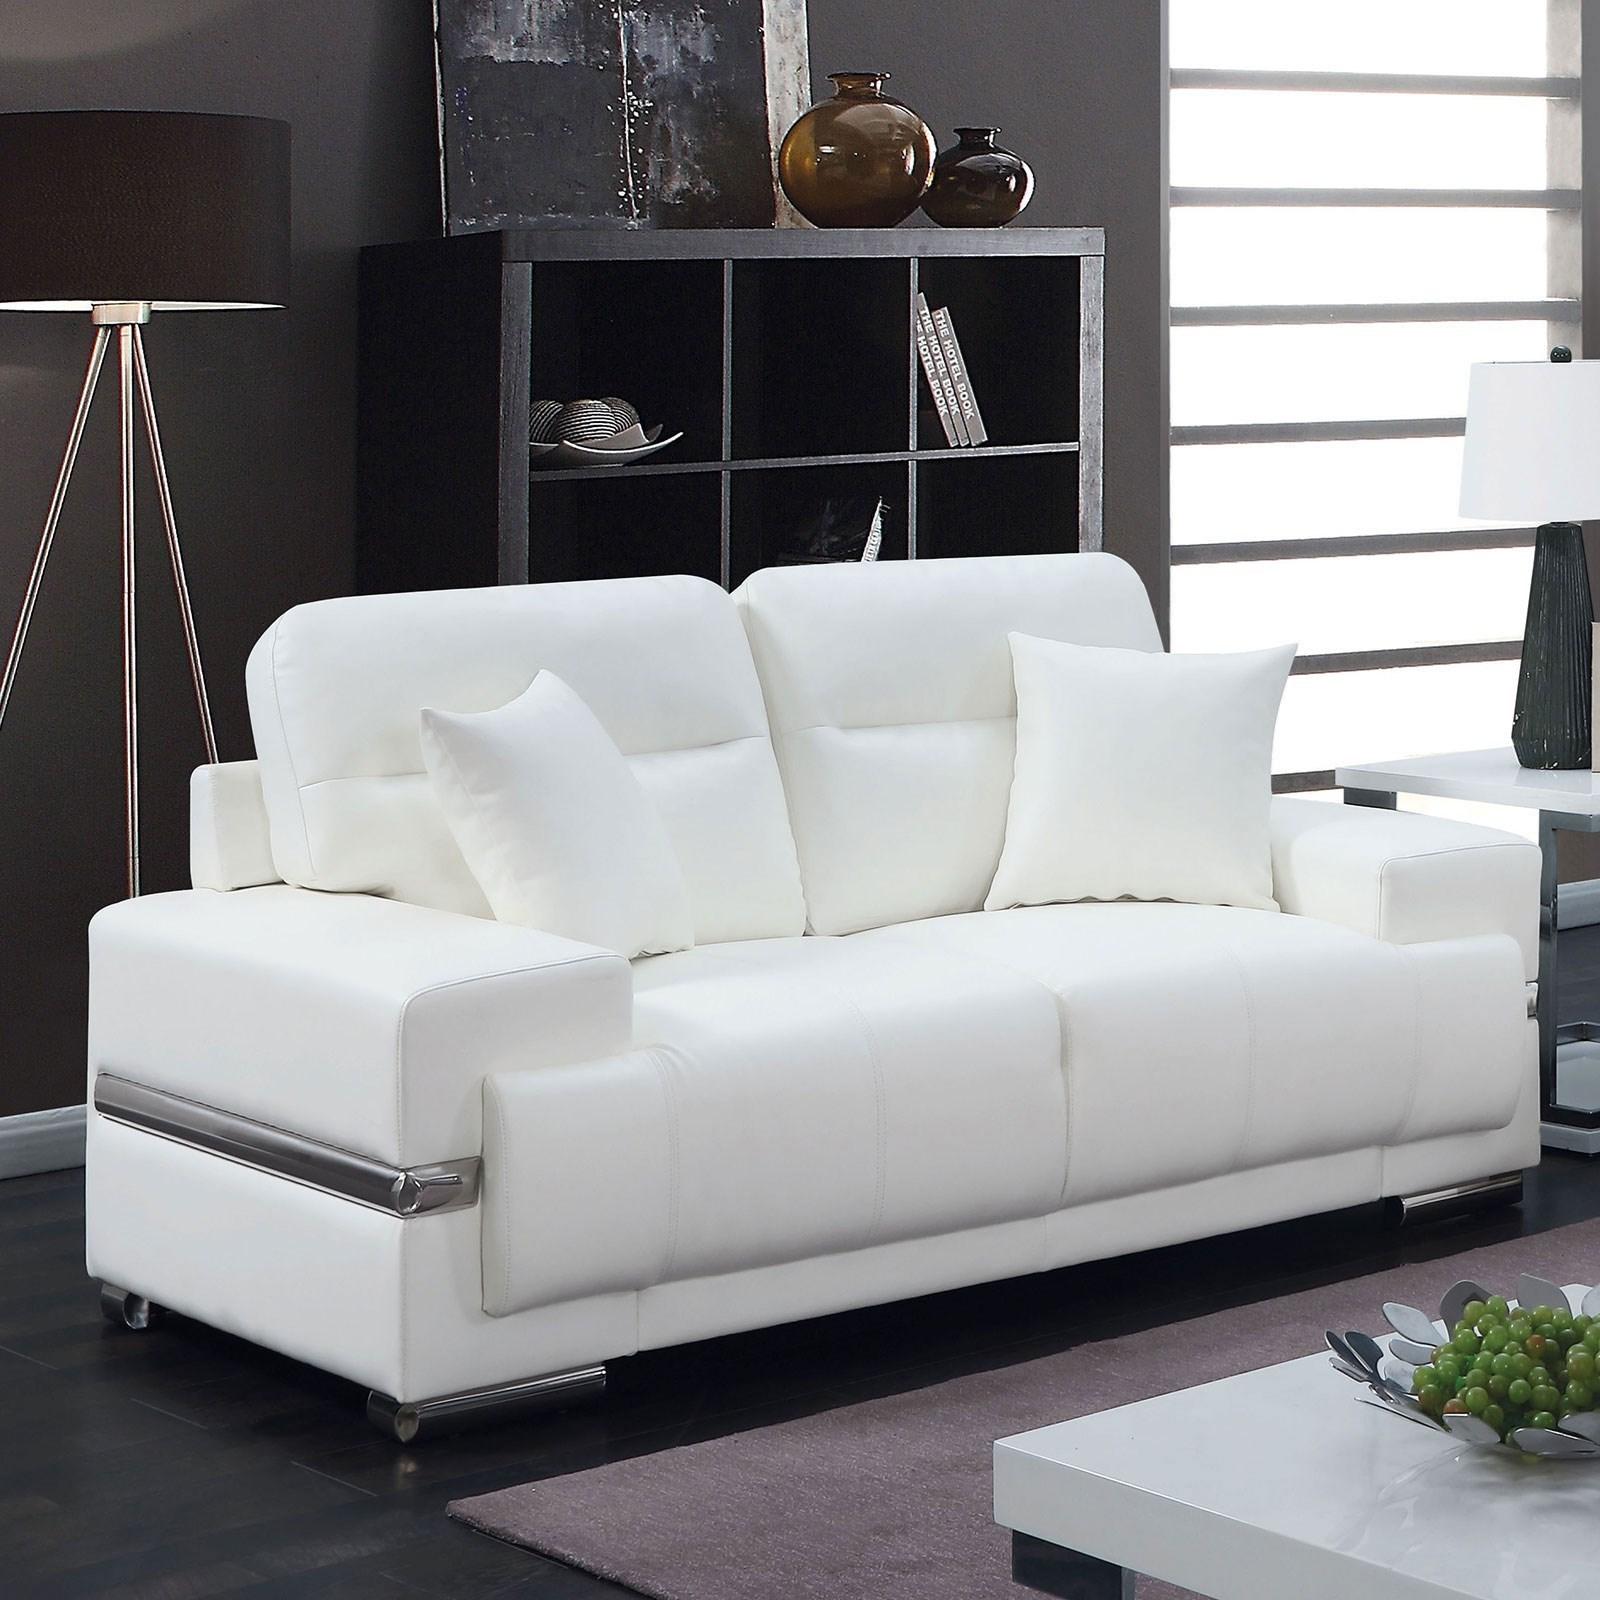 Zibak Loveseat by Furniture of America at Nassau Furniture and Mattress